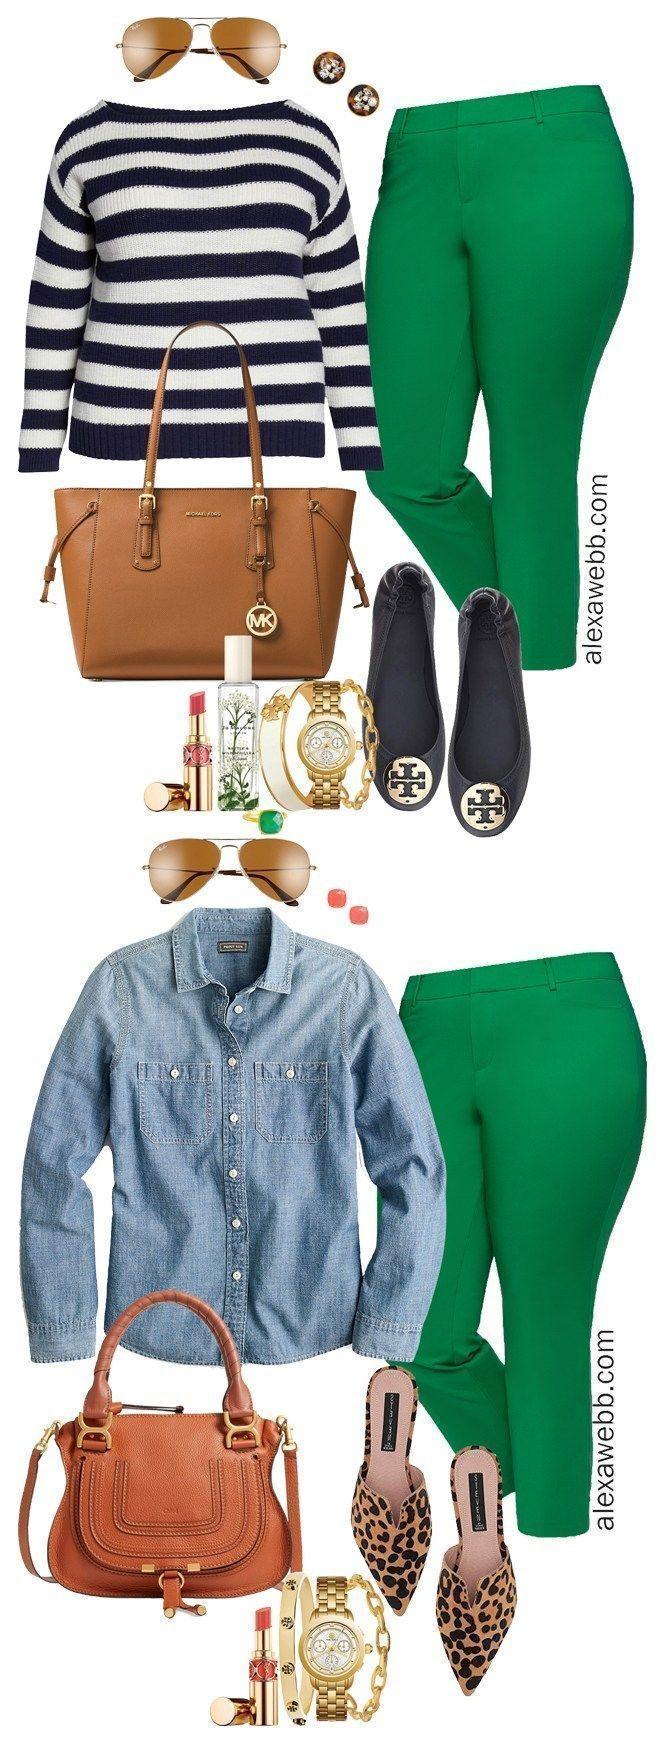 Plus Size Bright Green Pants - Part 2 - Alexa Webb -  Plus Size Bright Green Pants Outfits – Plus Size Spring Summer Work Outfit Idea – Plus Size Fas - #Alexa #Bright #Green #Pants #Part #plussizedresses #Size #Webb #womenglasses #womensfashionplussize #womensstyle